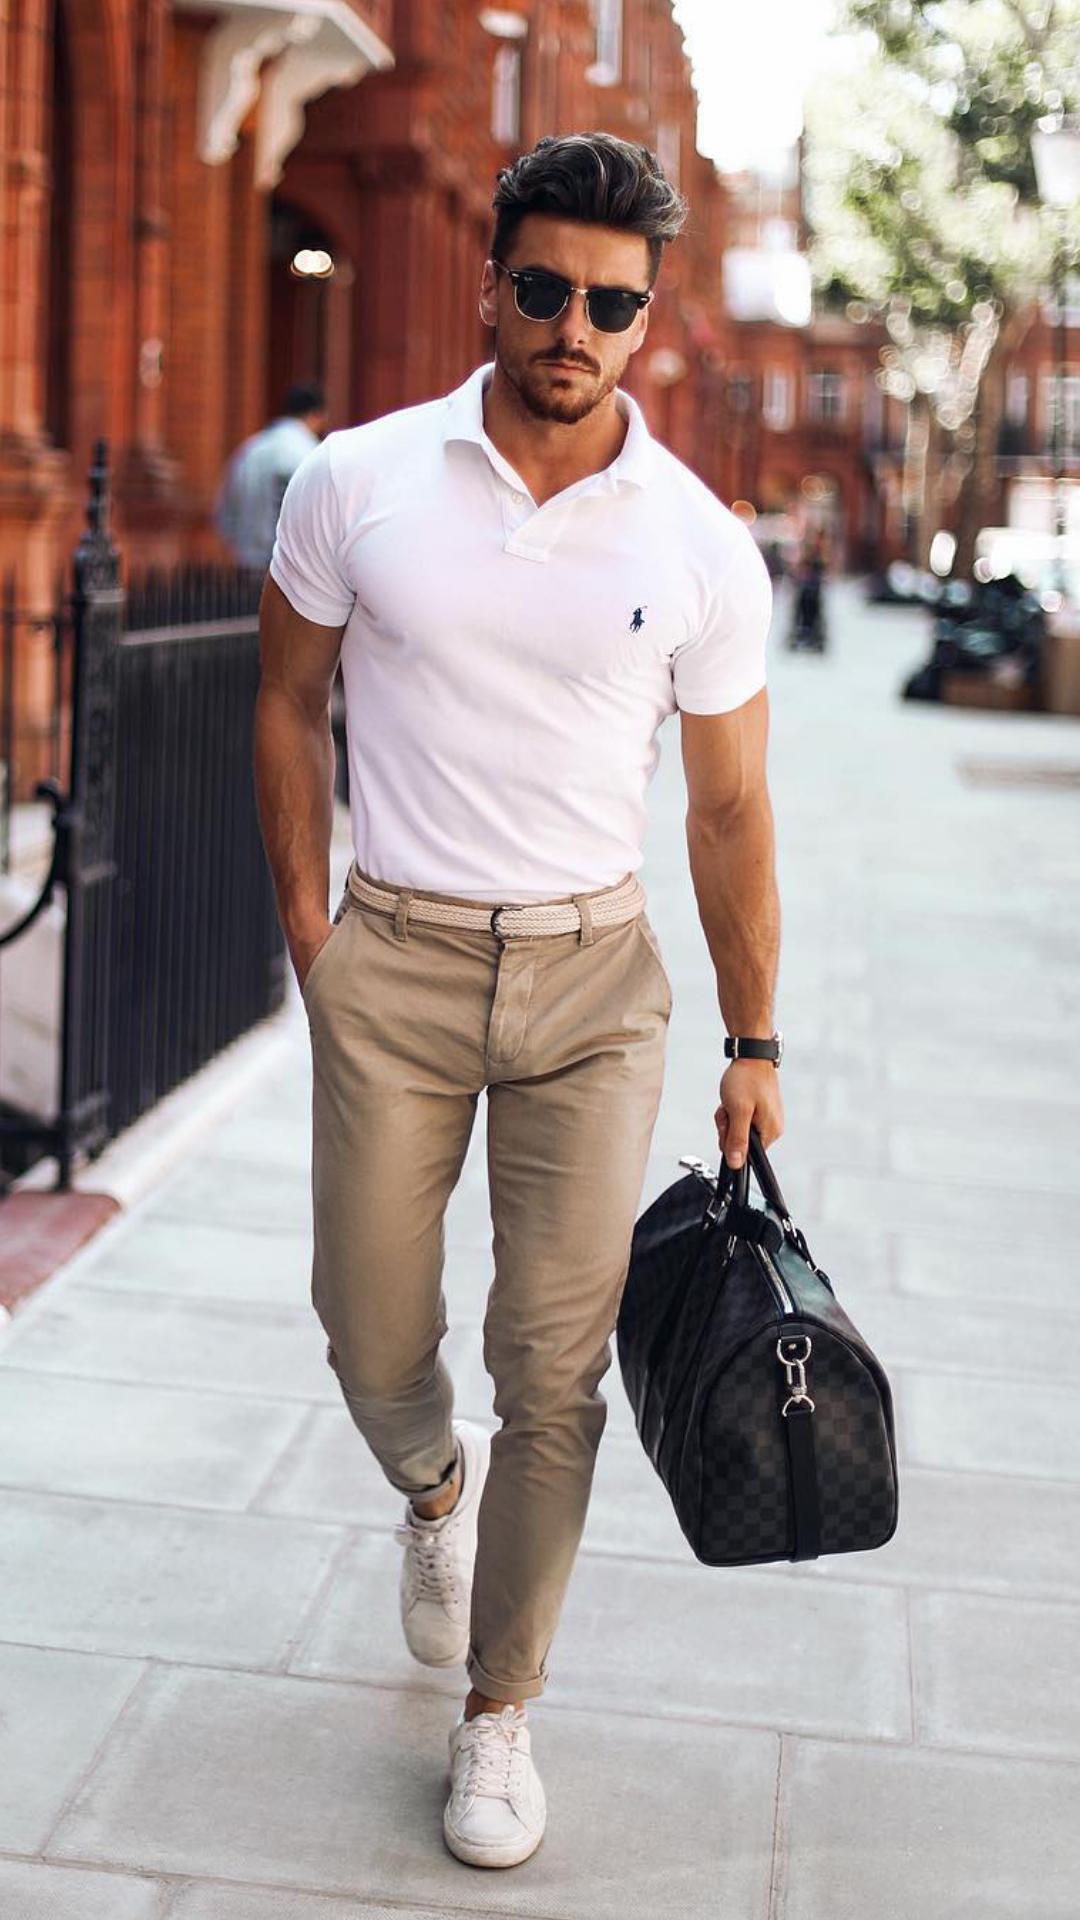 4a576aa094d2 White Polo Shirt Outfit Ideas For Men  poloshirt  shirt  outfitideas   mensfashion  streetstyle